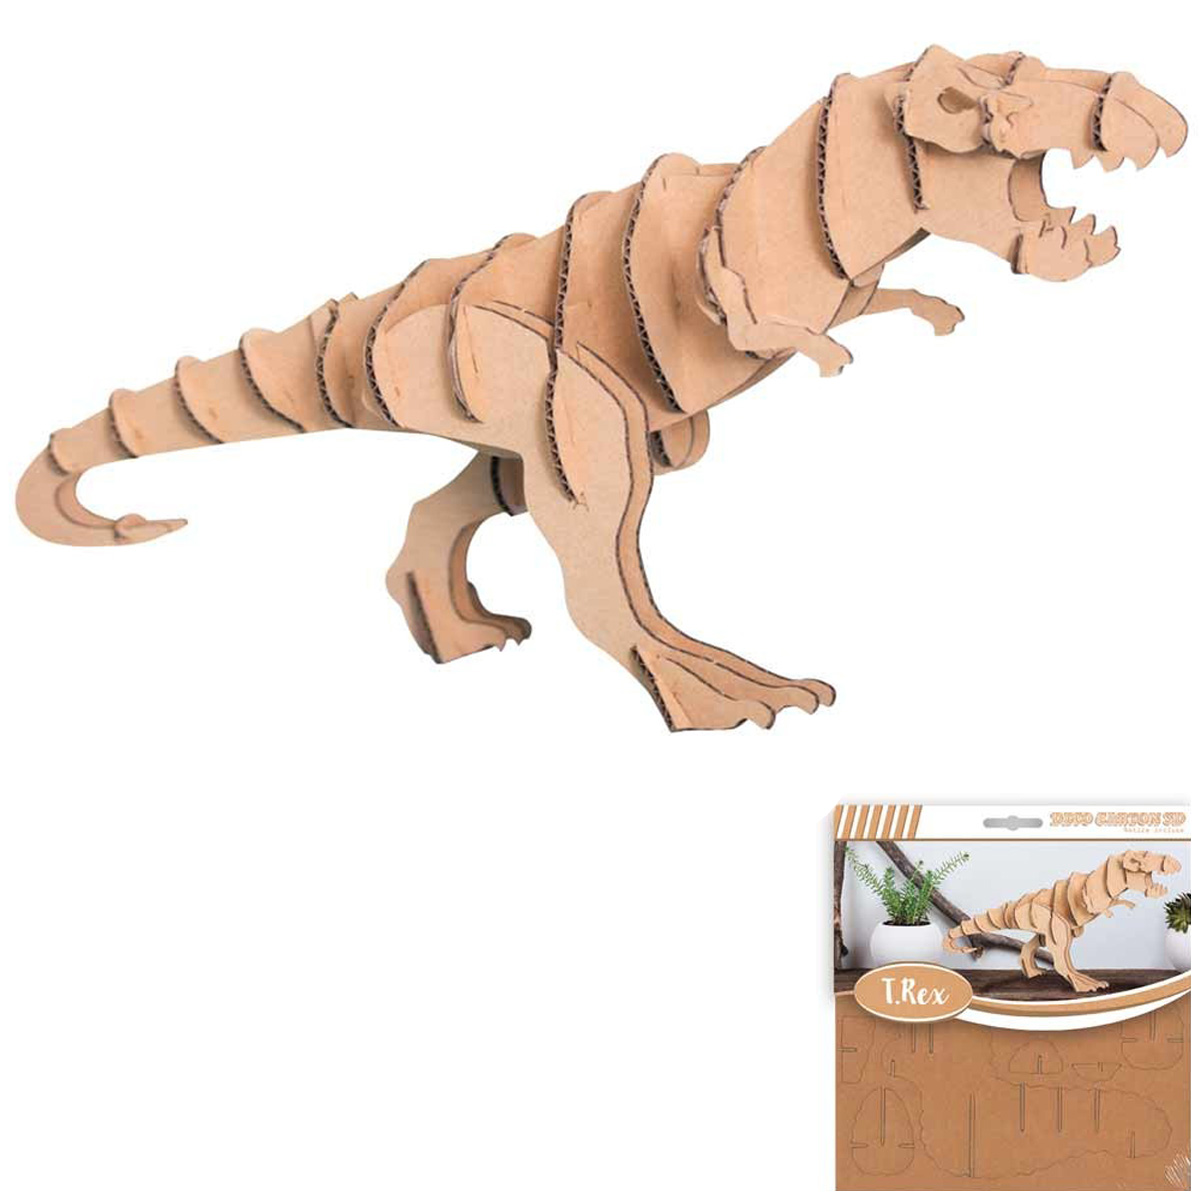 Figurine carton 3D \'Dinosaure\' - planches 165x175 cm - [Q4558]